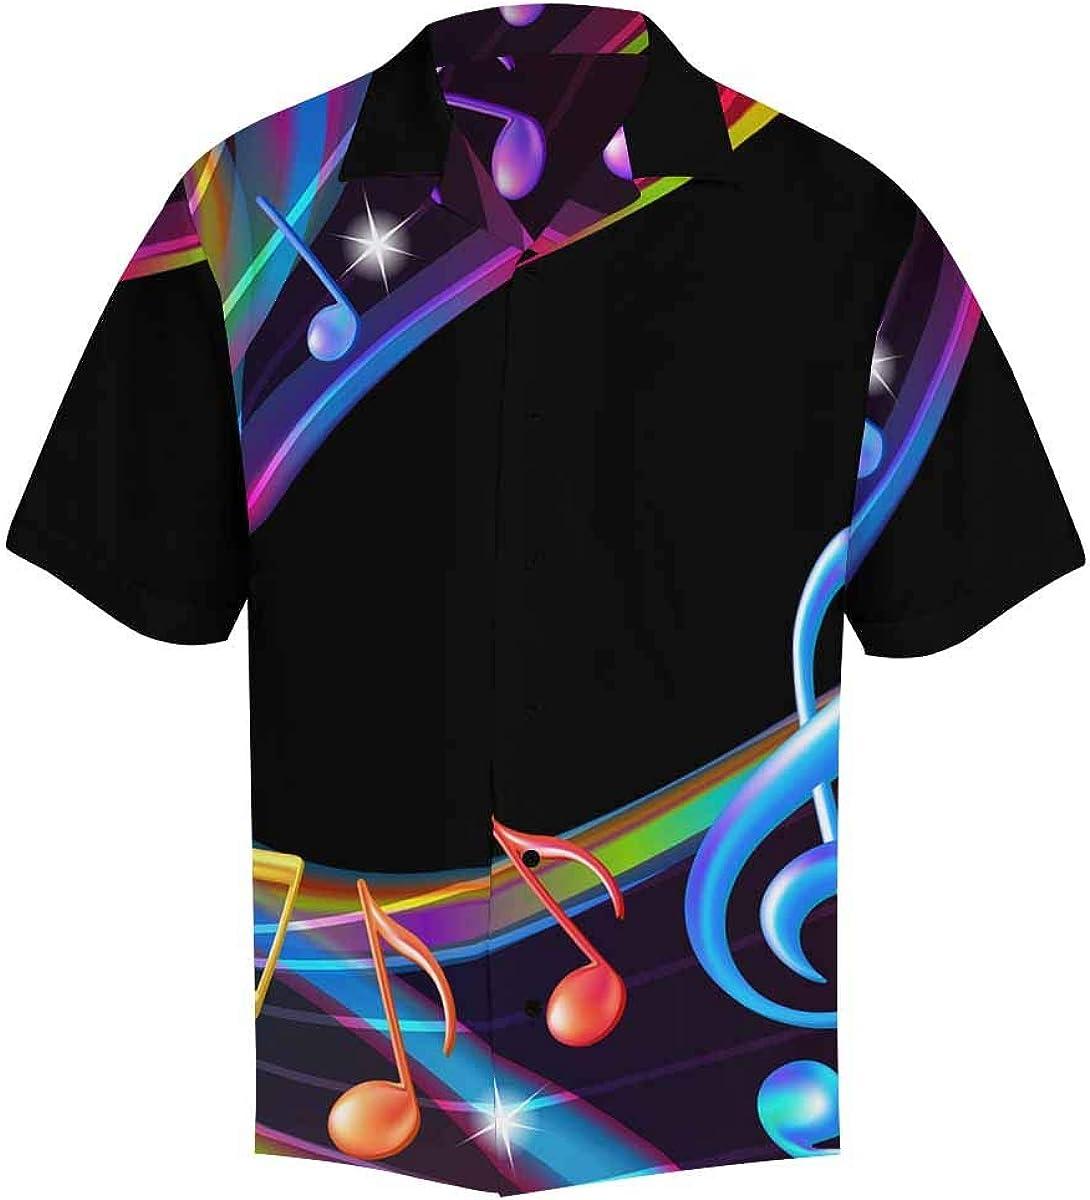 InterestPrint Men's Casual Button Down Short Sleeve Fantasy Music Clef Hawaiian Shirt (S-5XL)